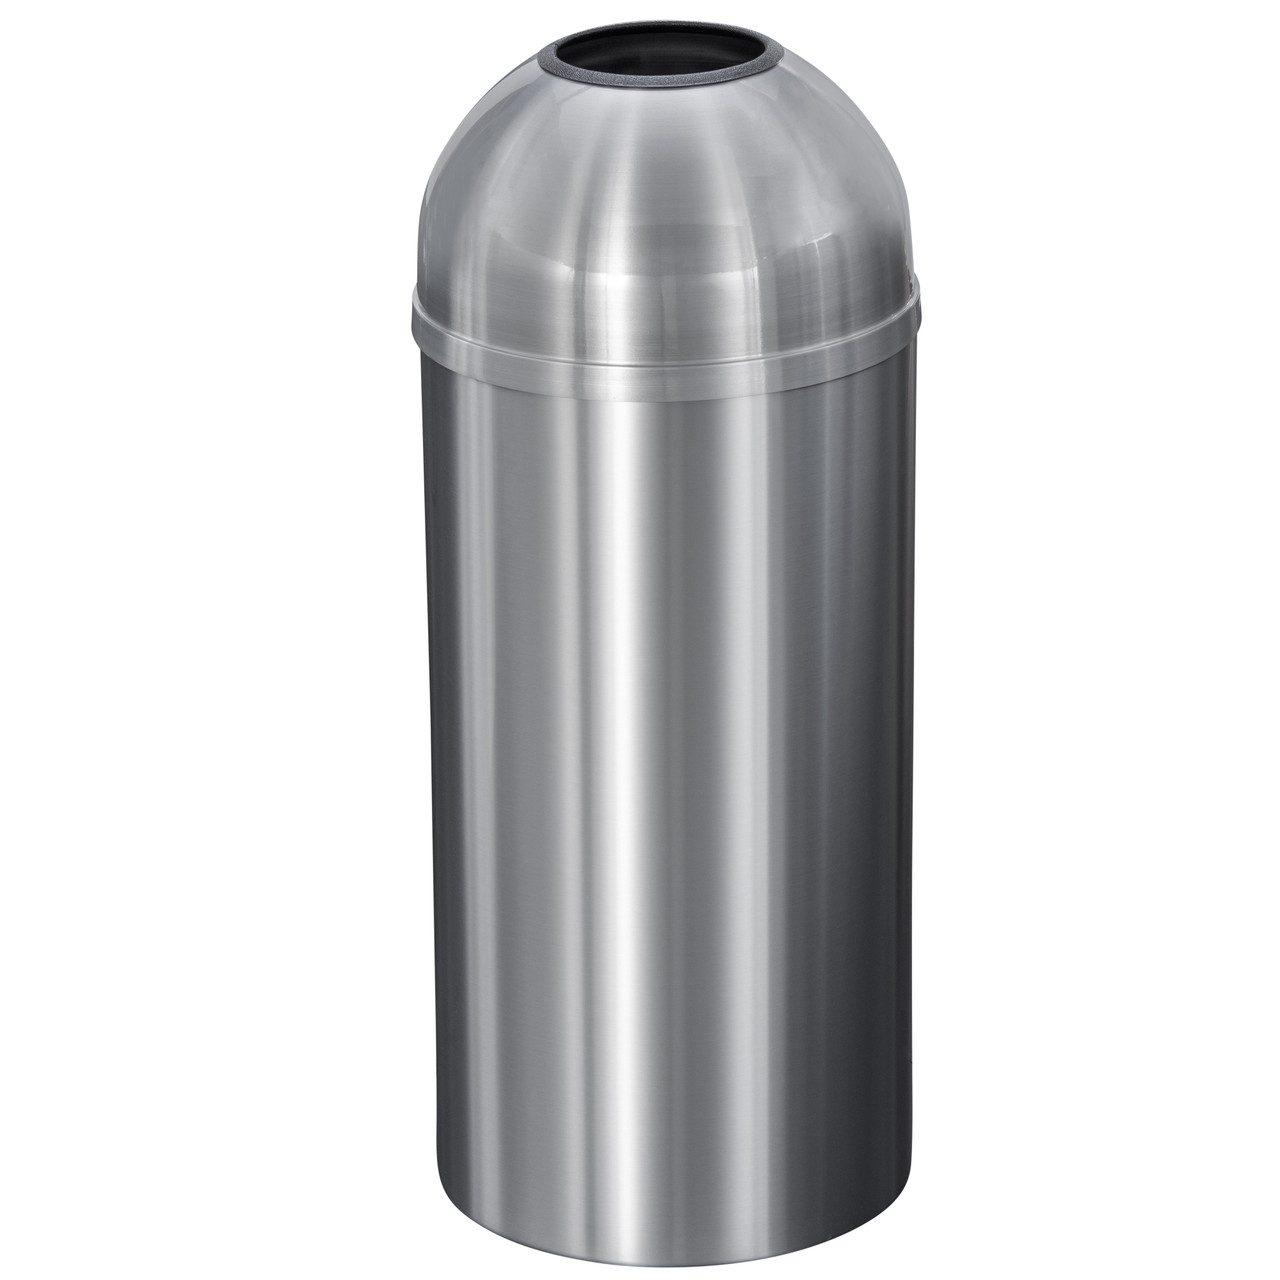 New Yorker 12 Gallon T1530SA Dome Top Trash Receptacle w/Plastic Liner